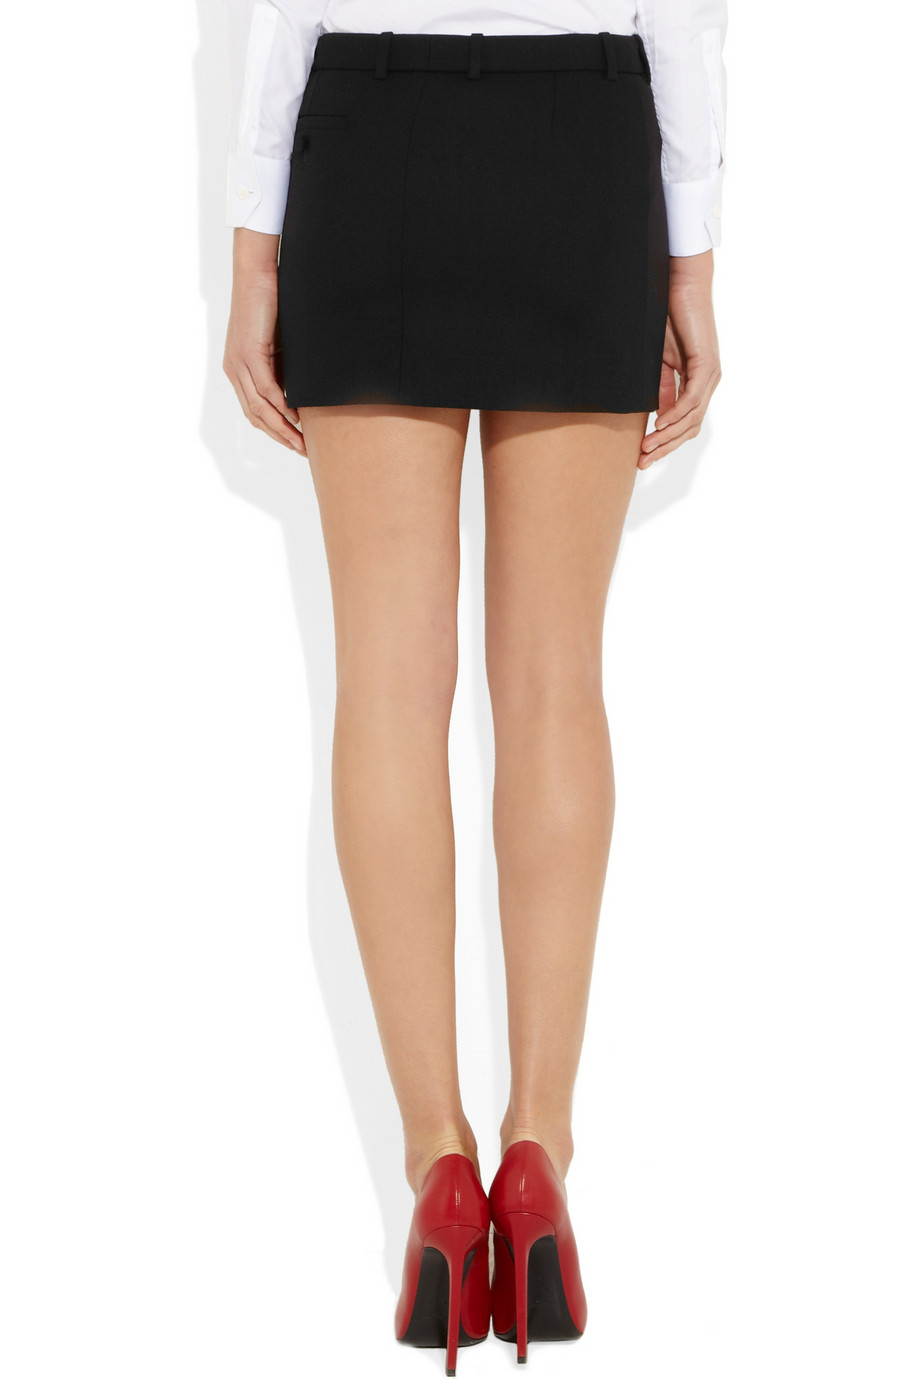 Saint laurent Wool Mini Skirt in Black   Lyst